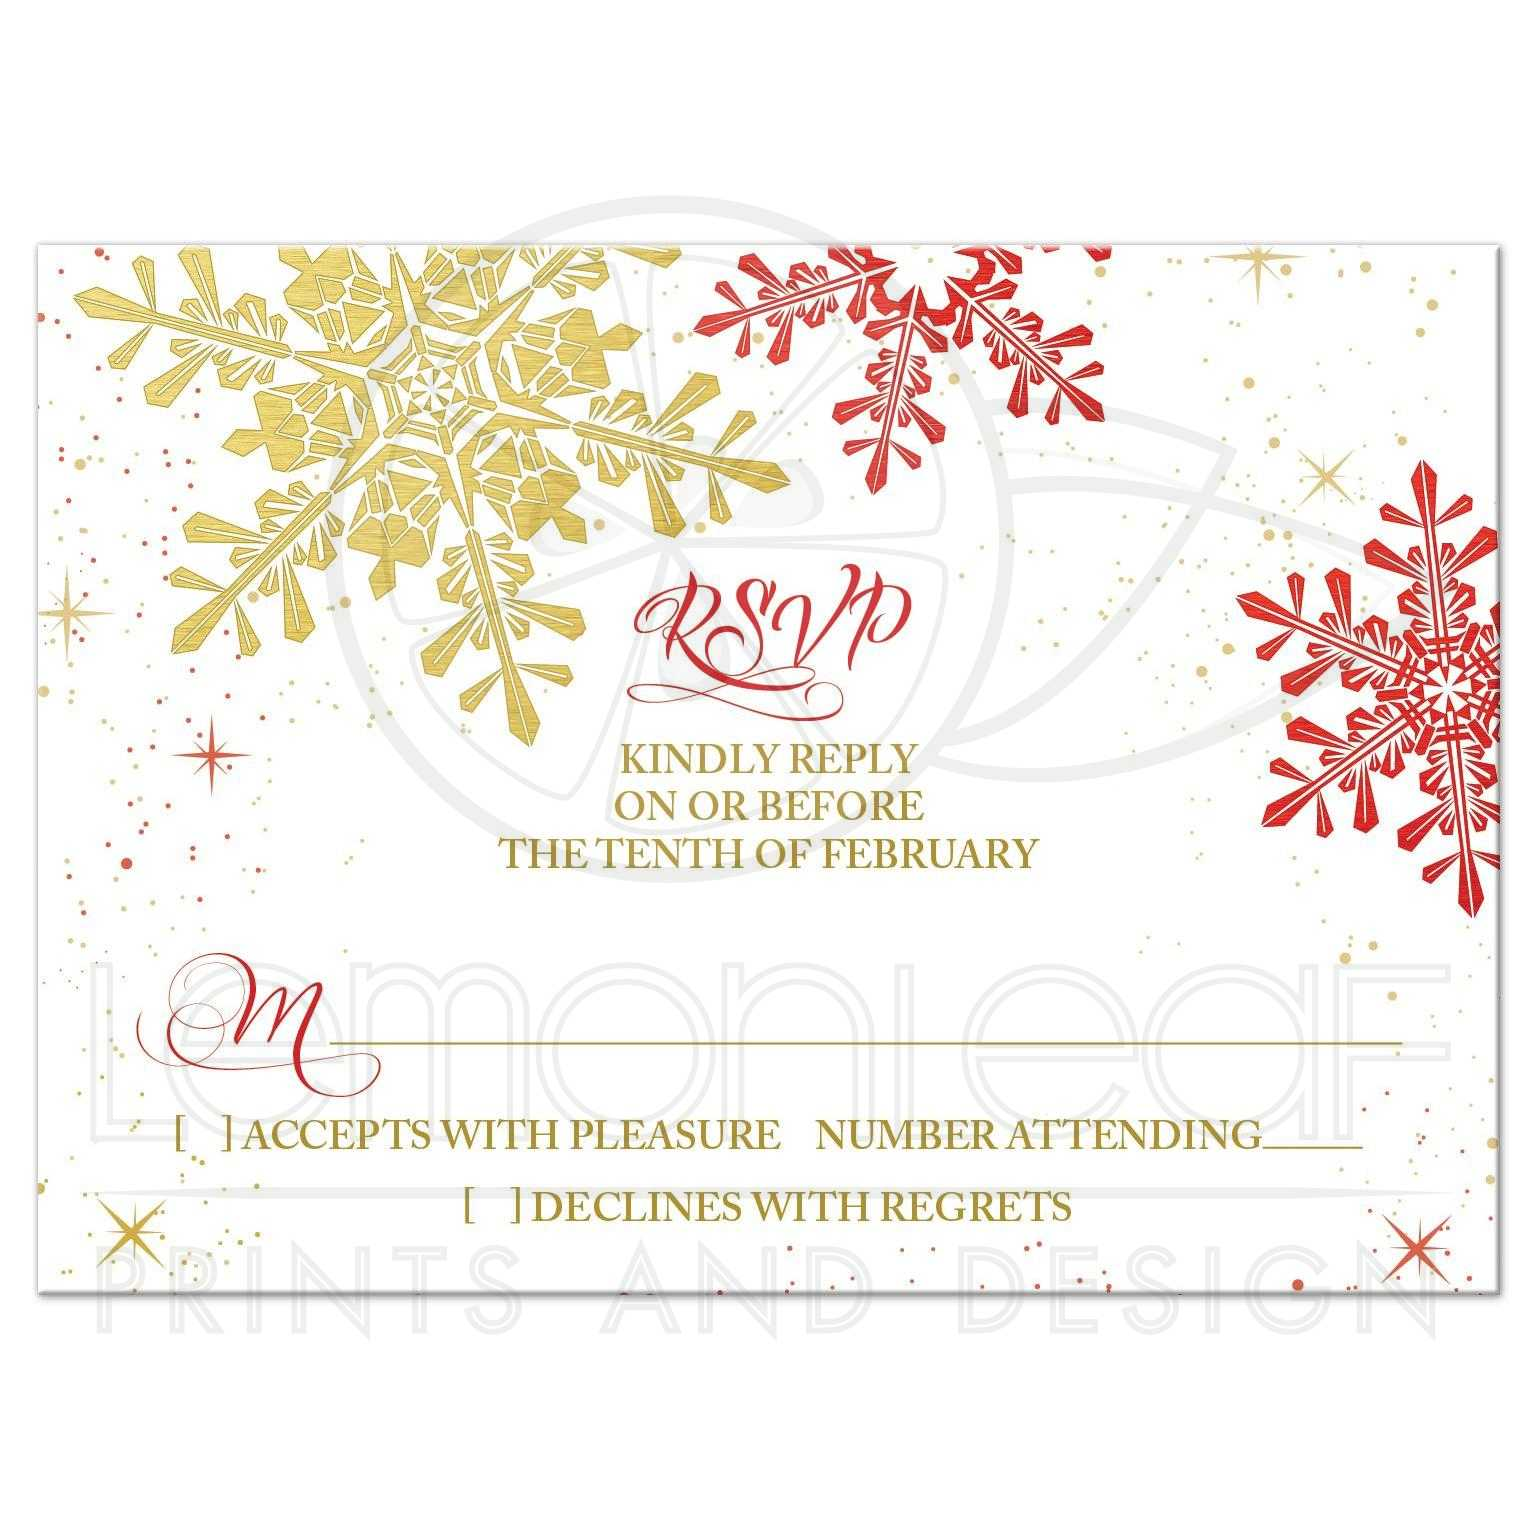 rustic wedding rsvp cards wedding invitation and rsvp card kraft